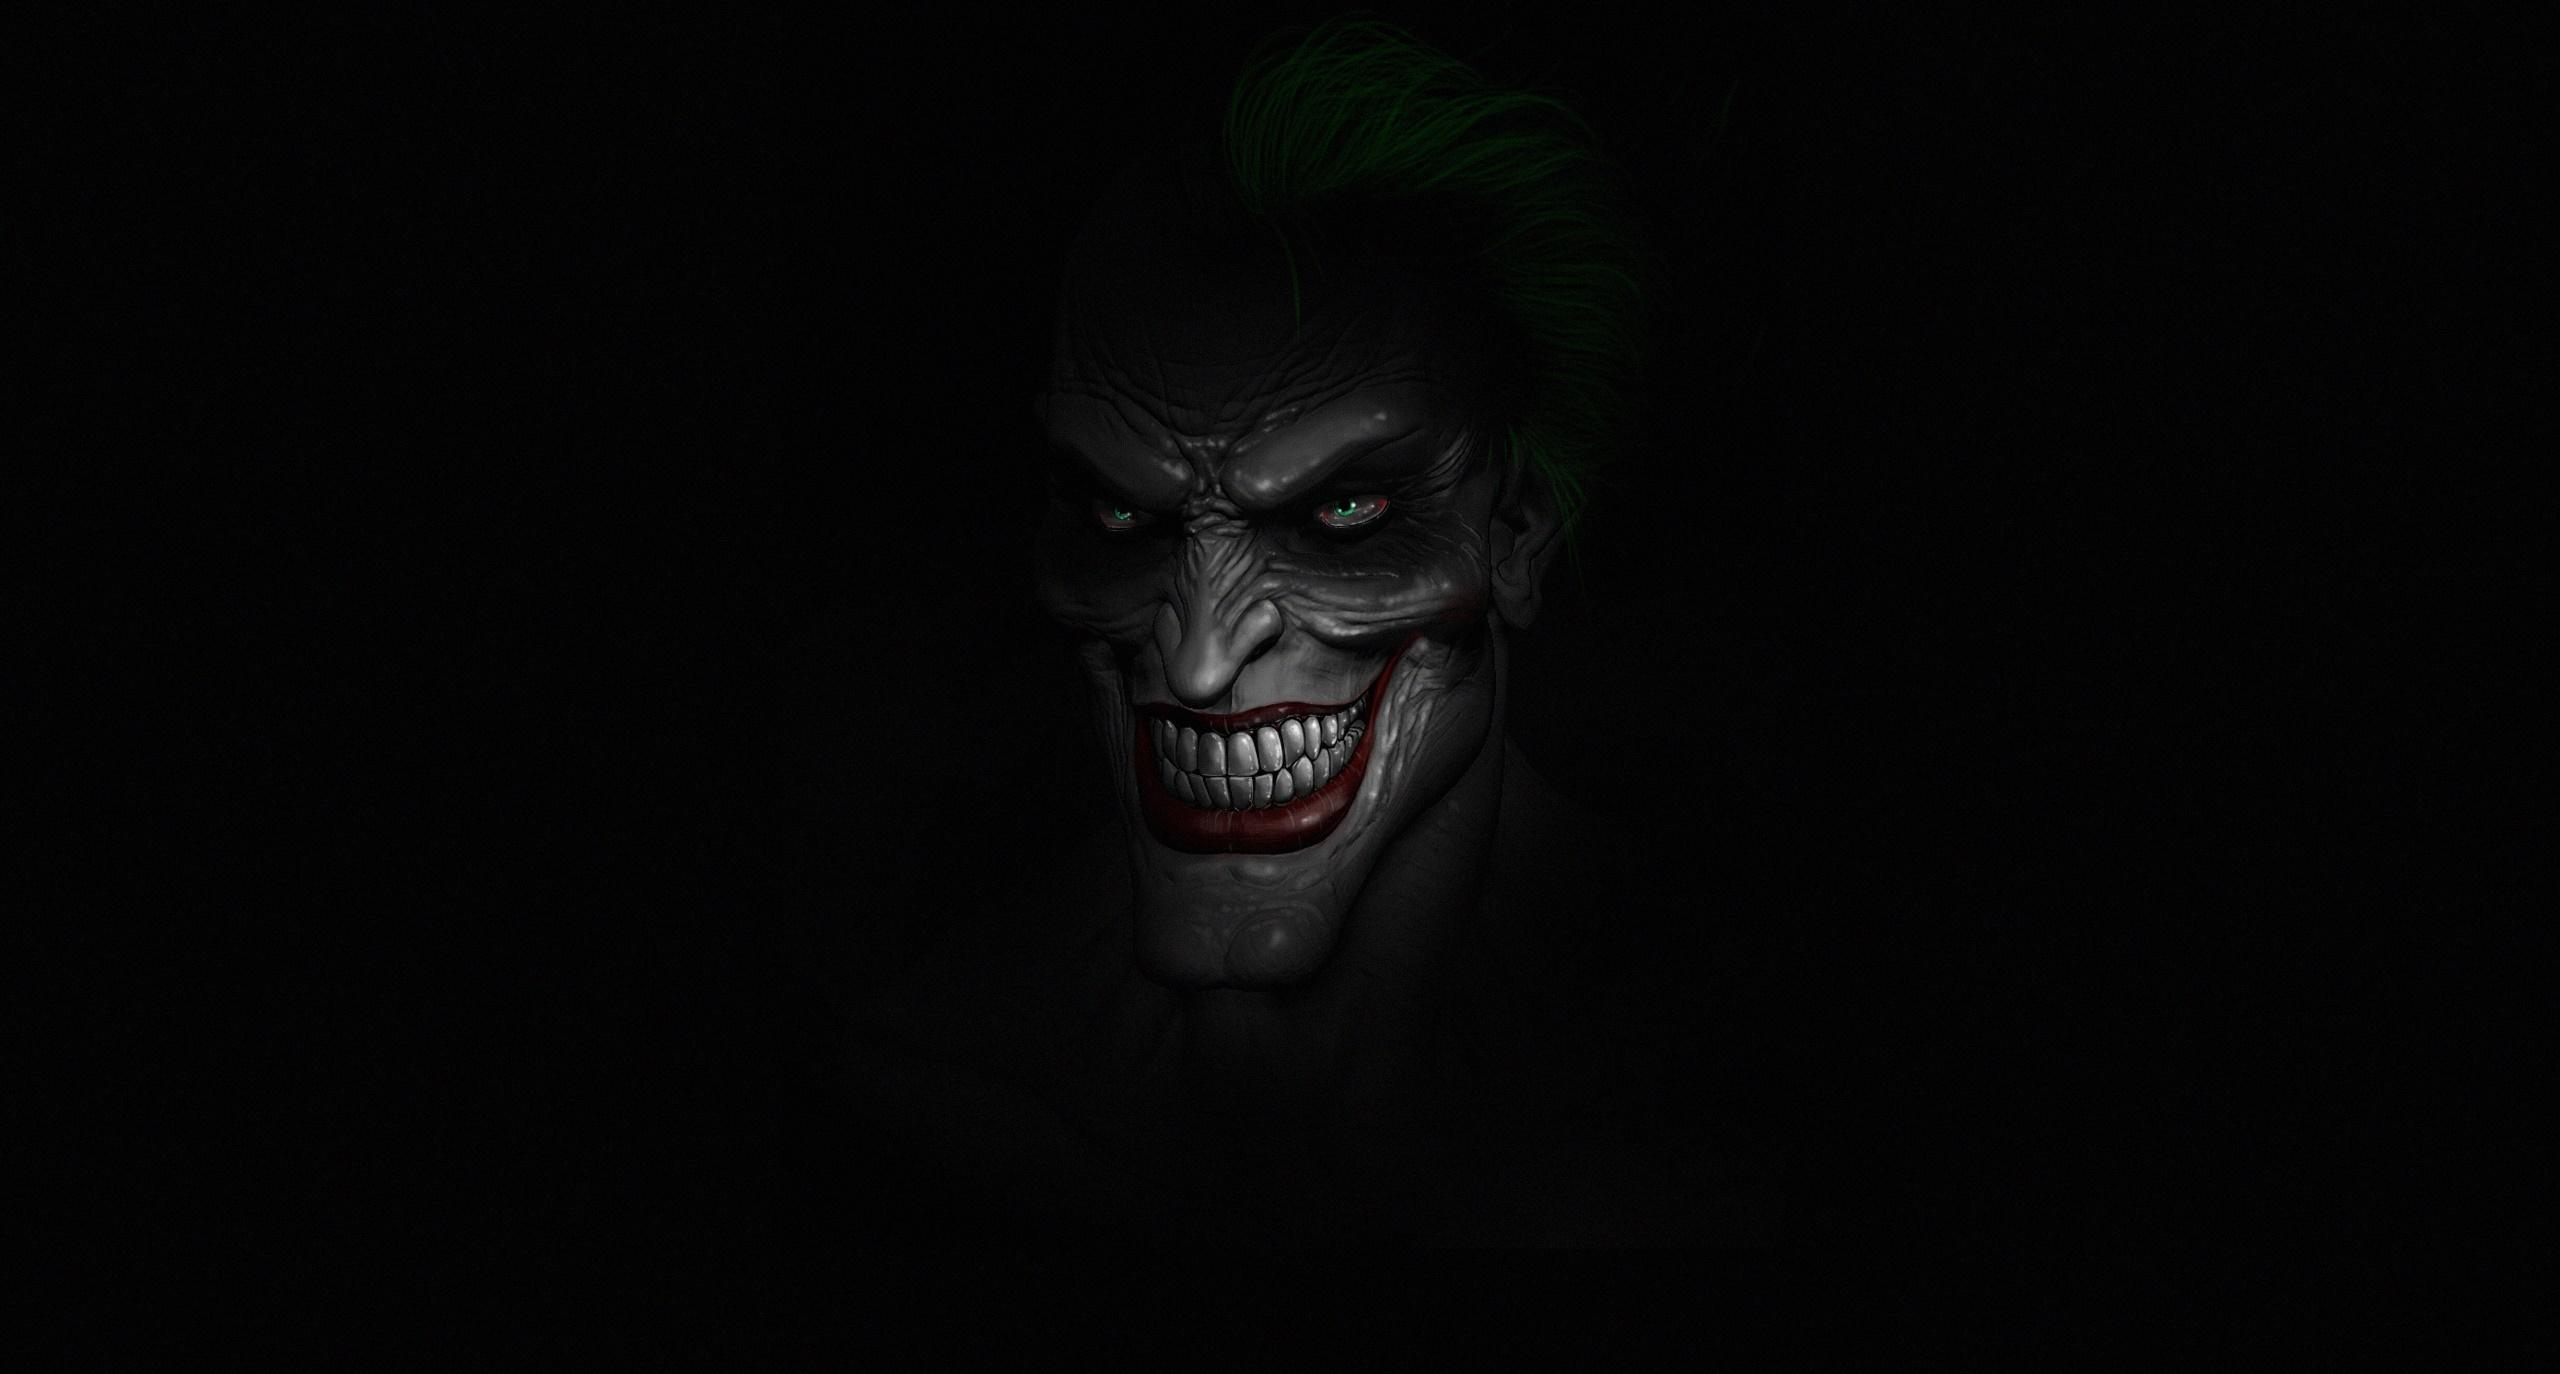 Joker Dark Minimalist Wallpapers - HD Wallpapers